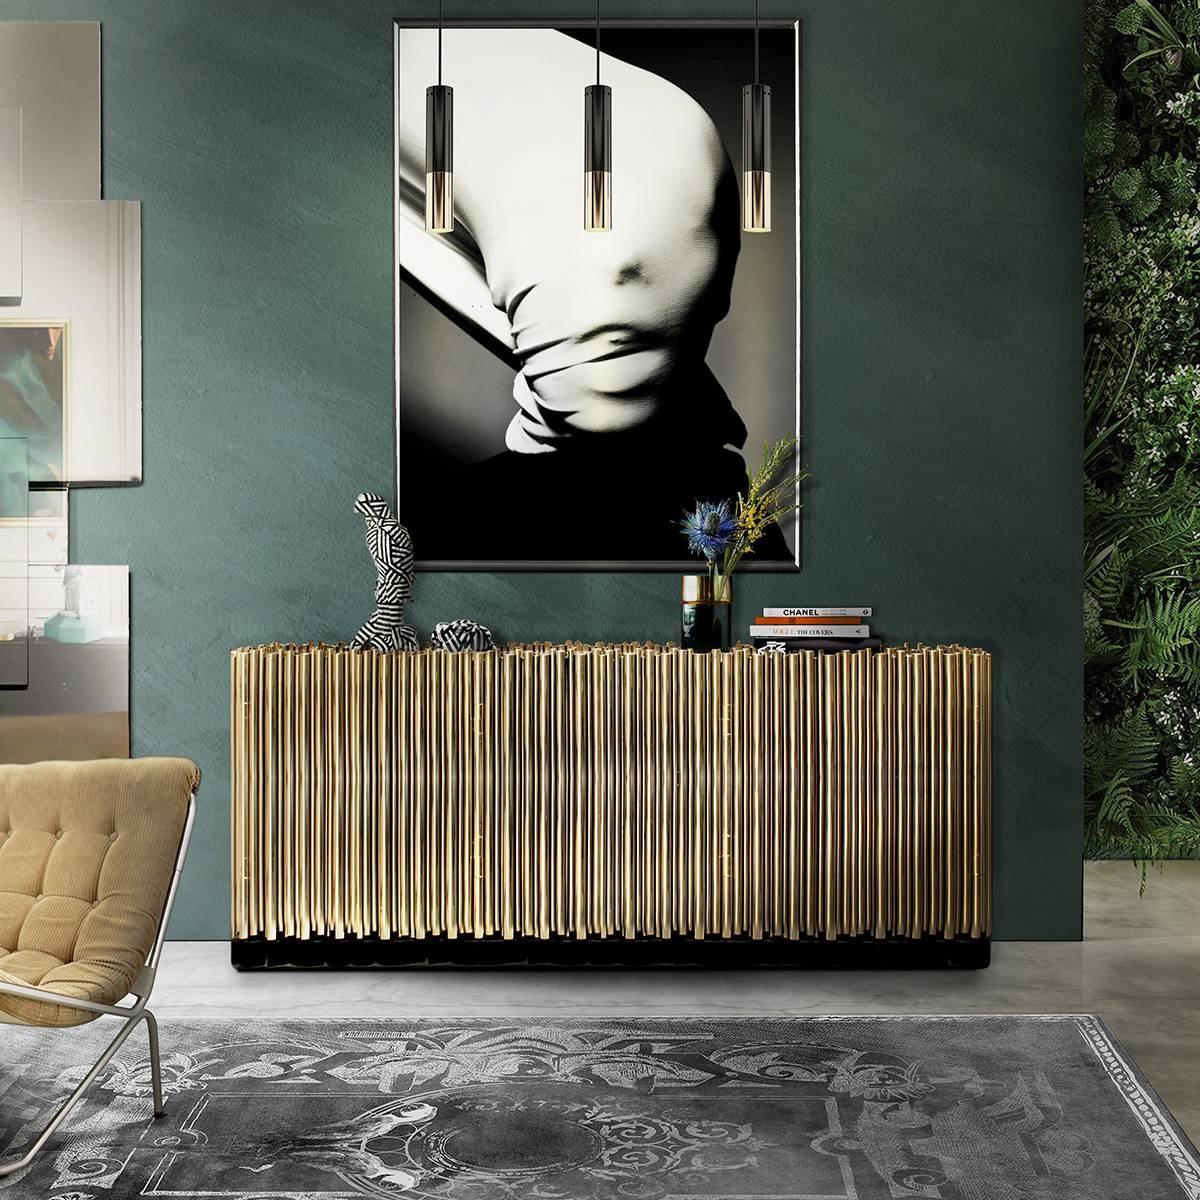 Elegant Dining Room Sideboard Decorating Ideas Throughout Elegant Sideboards (#4 of 15)